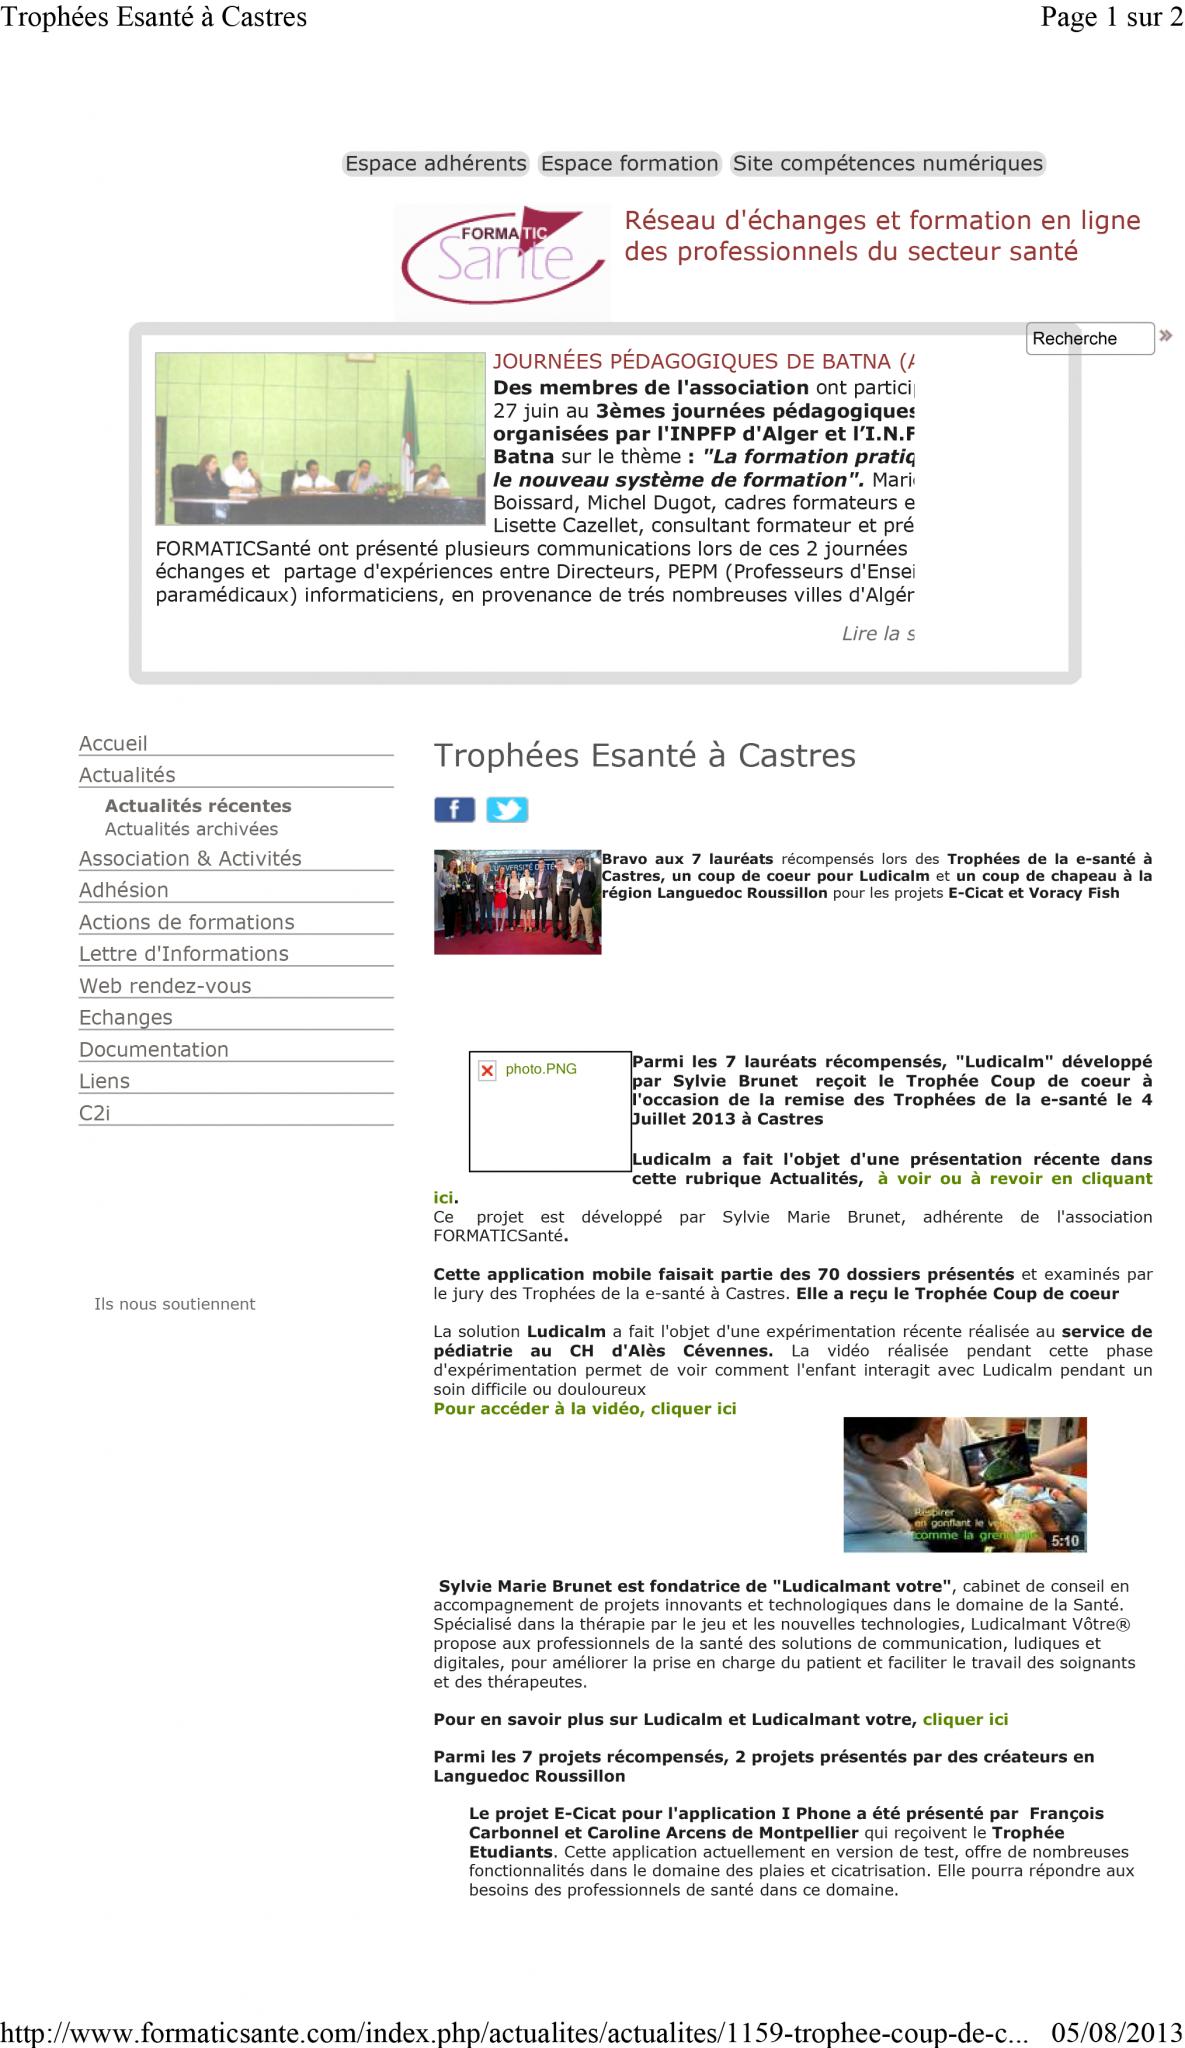 Trophies e-health at Castres